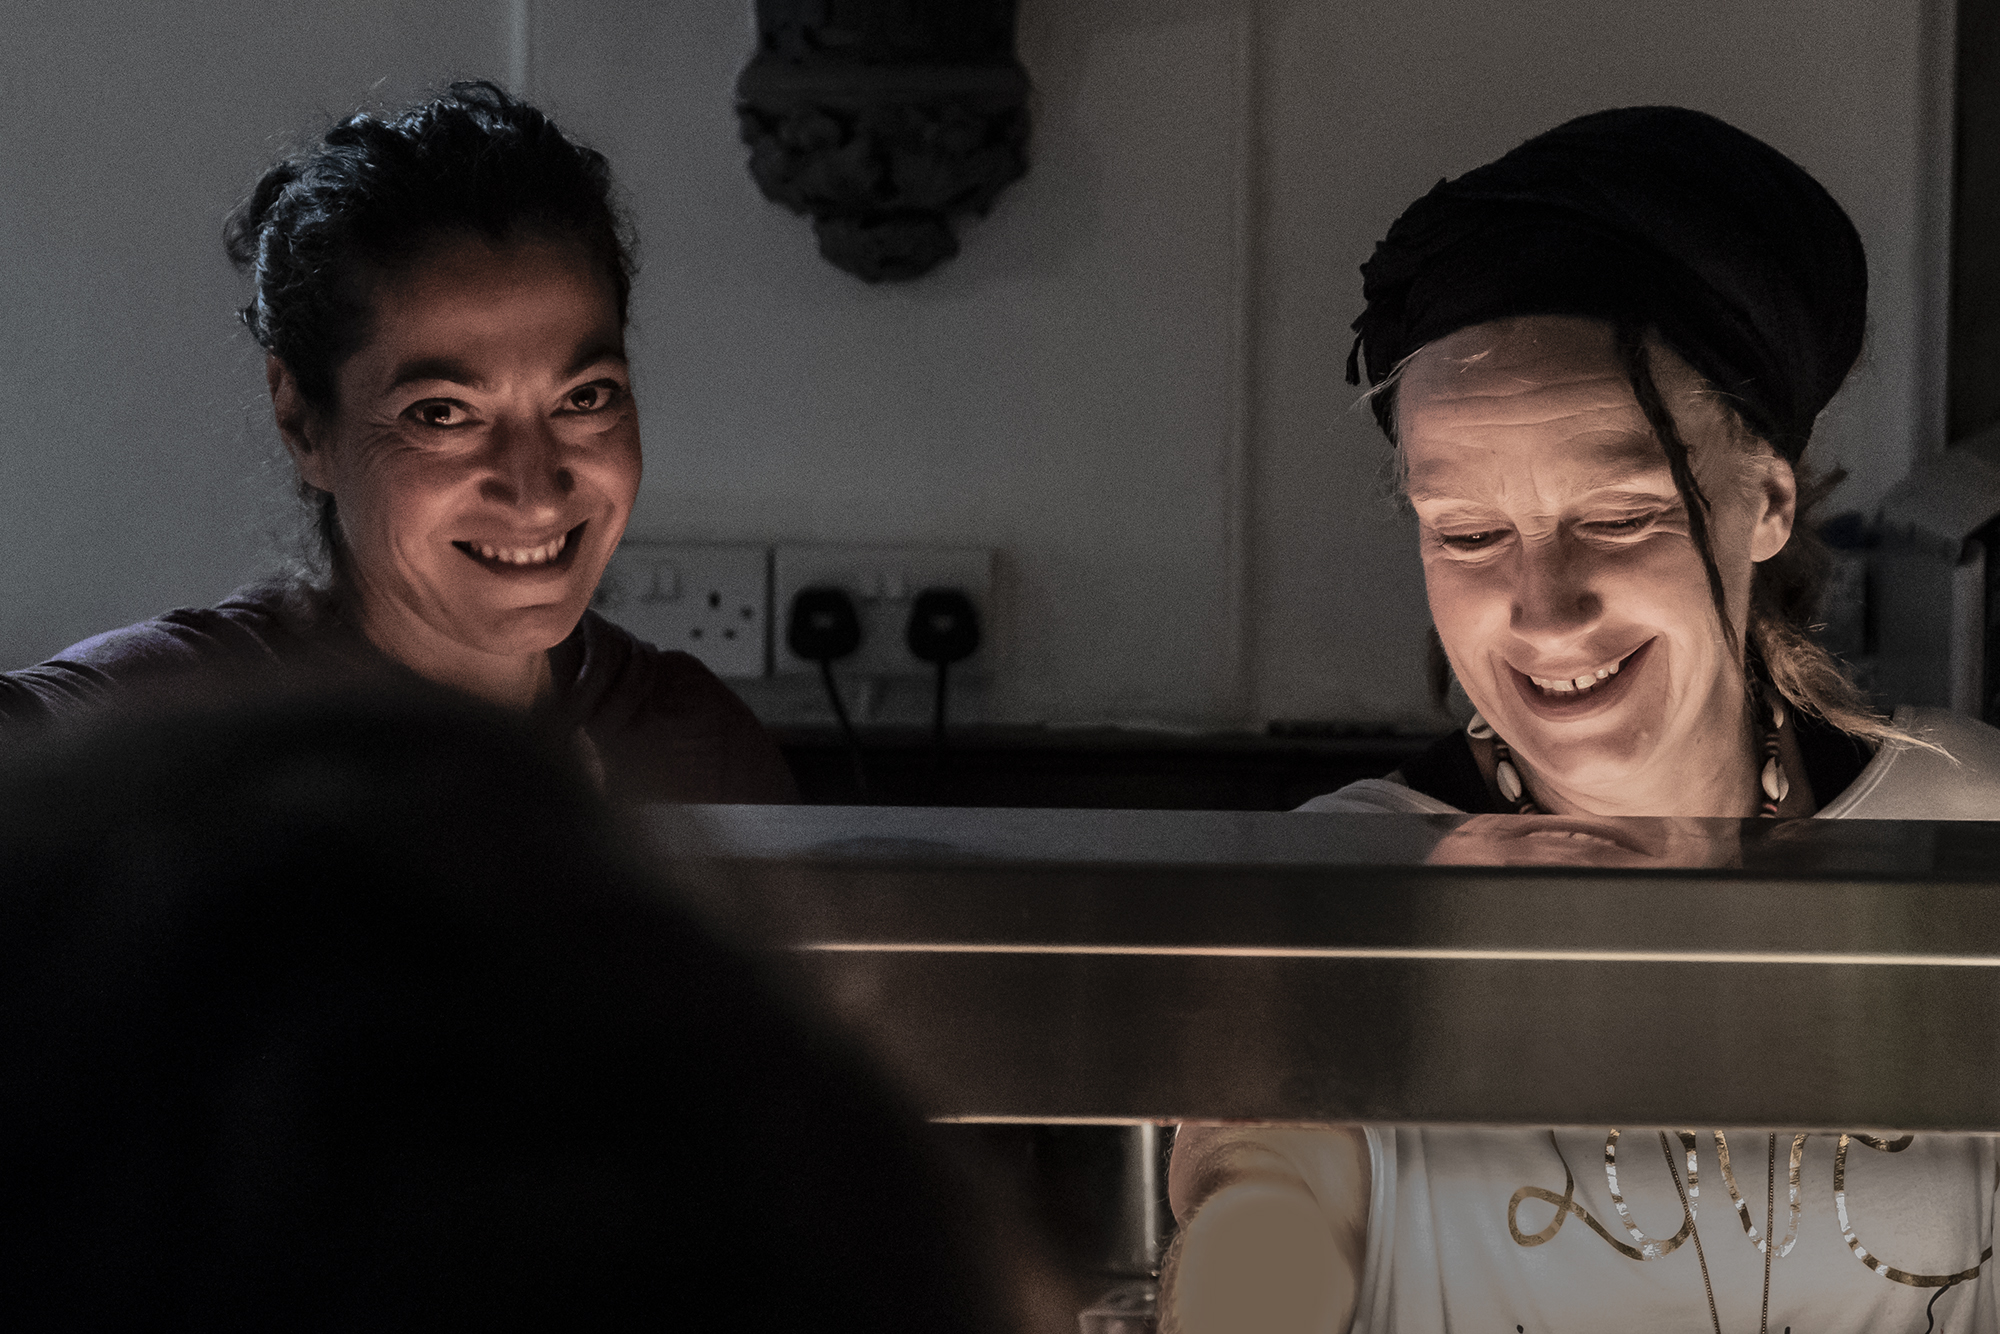 the cooks-Sosi Kaskanian and Amanda Downes .jpg